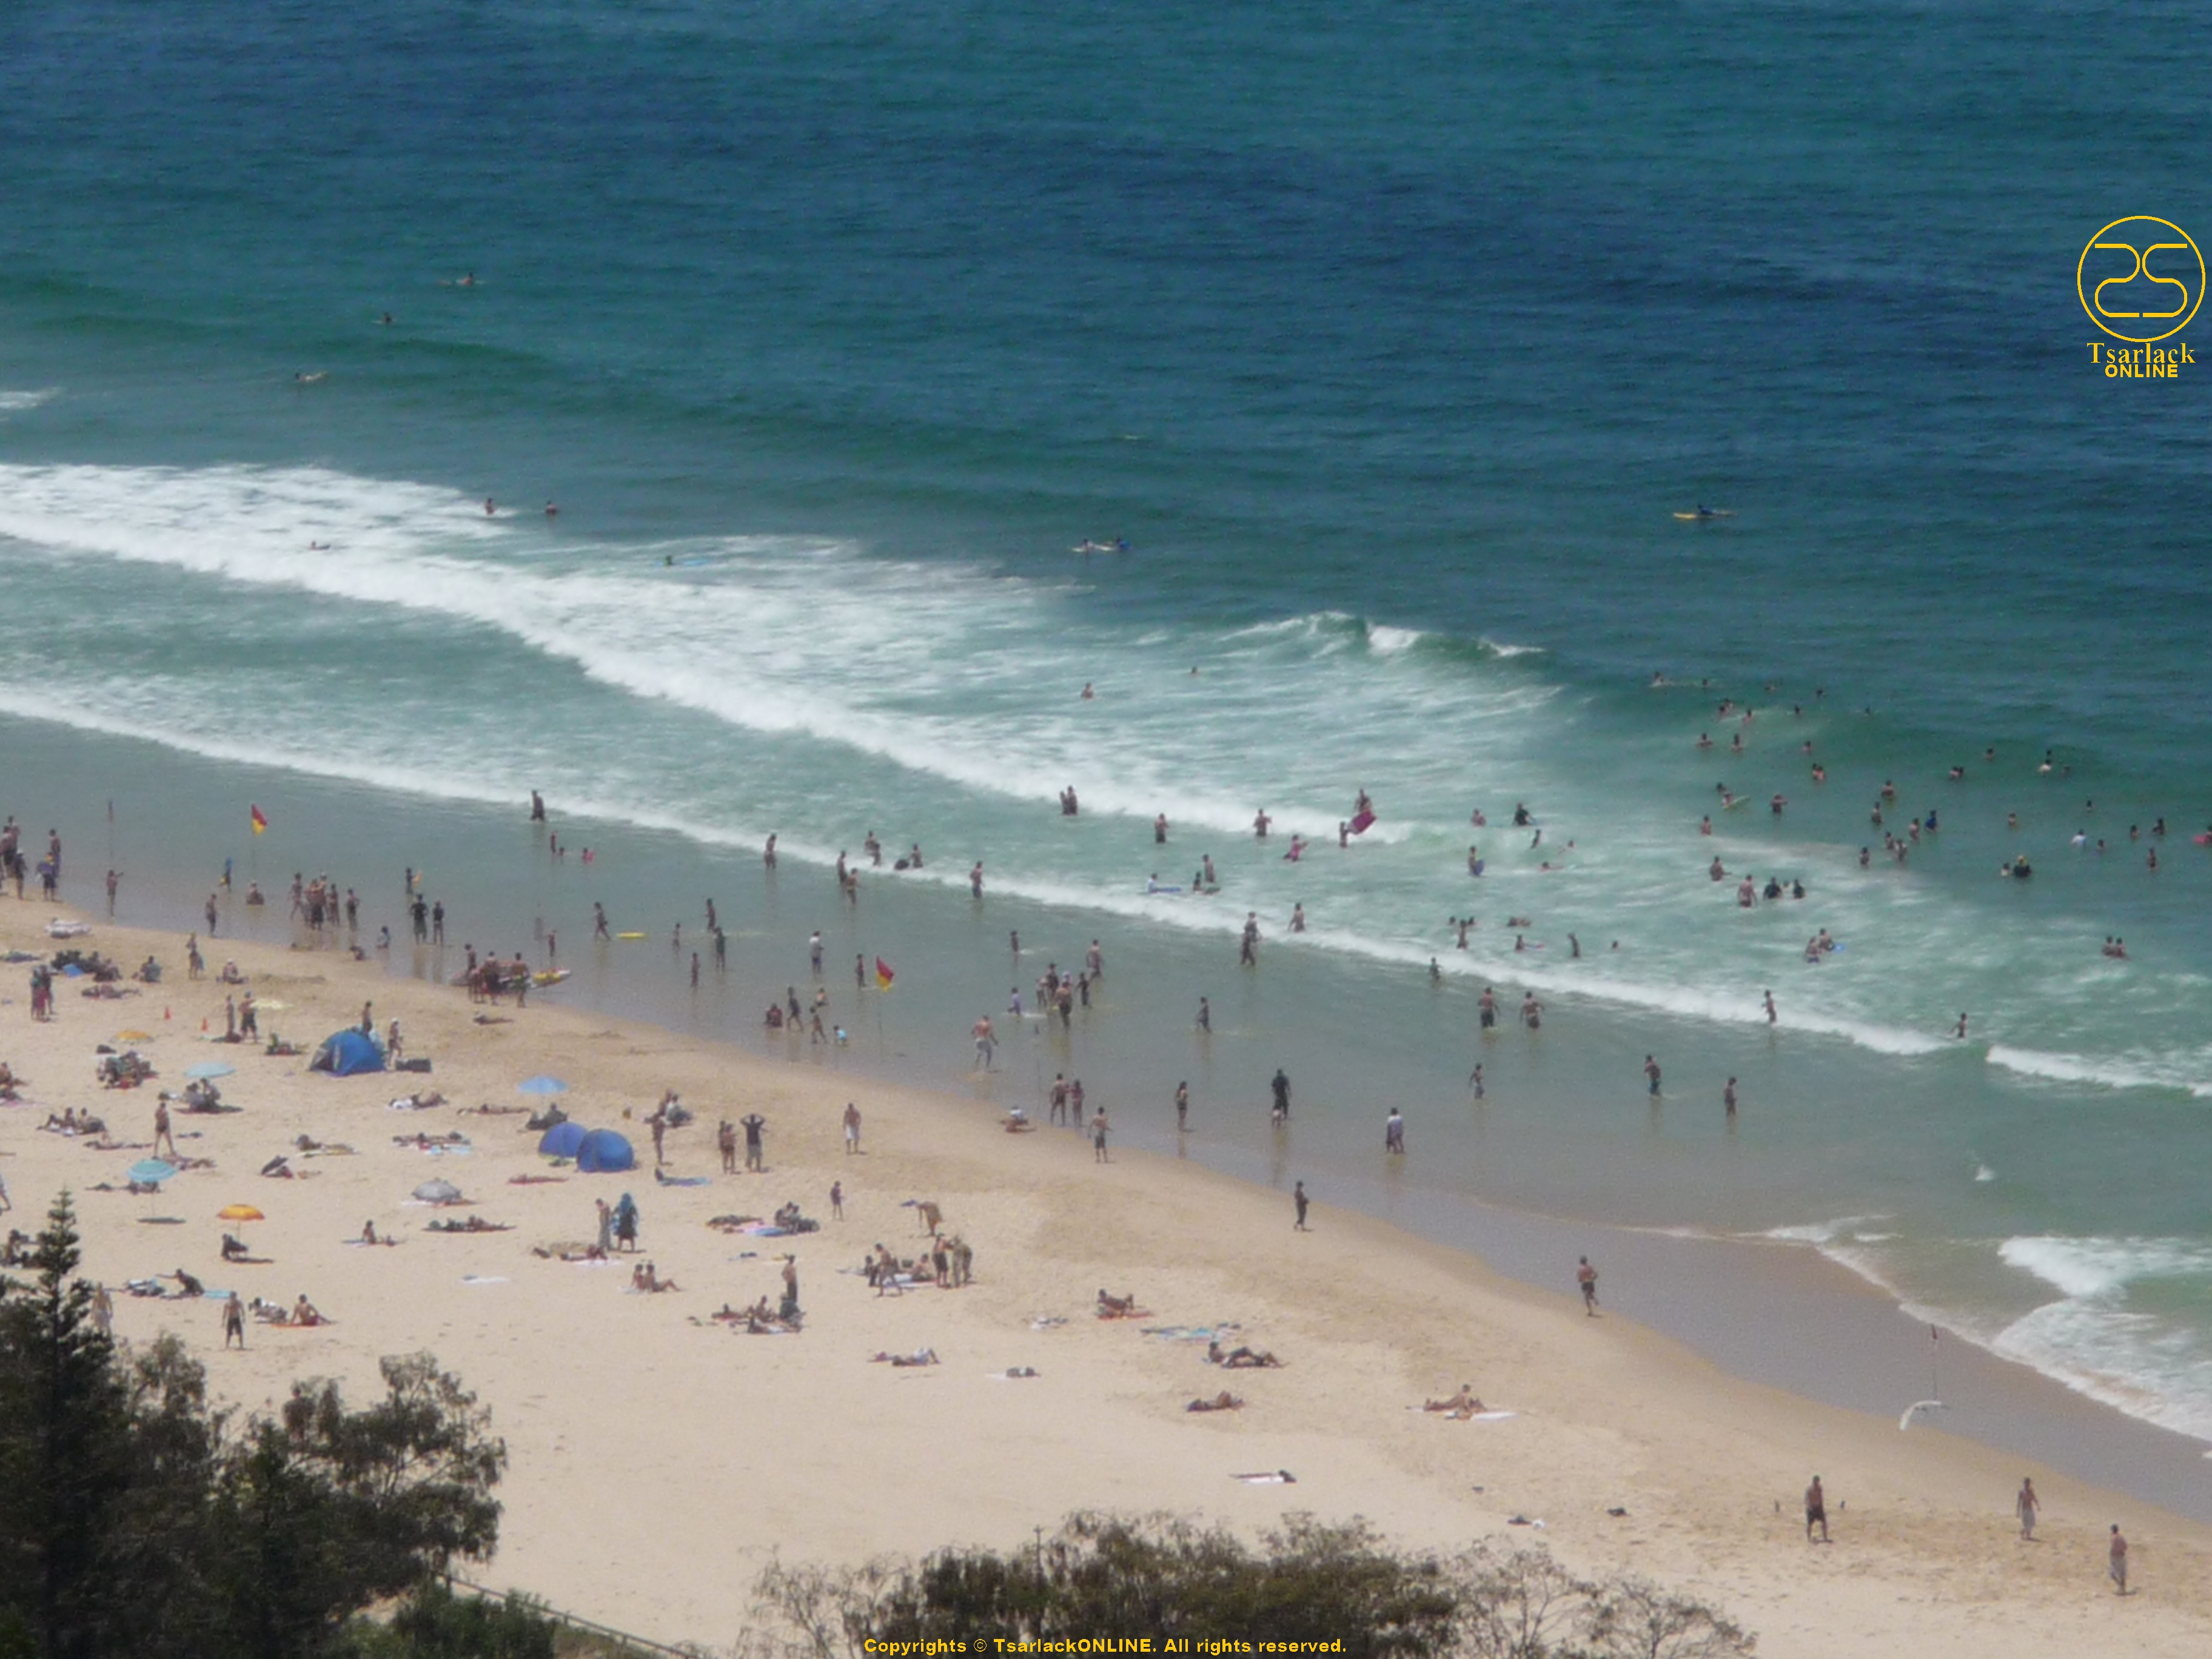 16 Days in Australia's East Coast